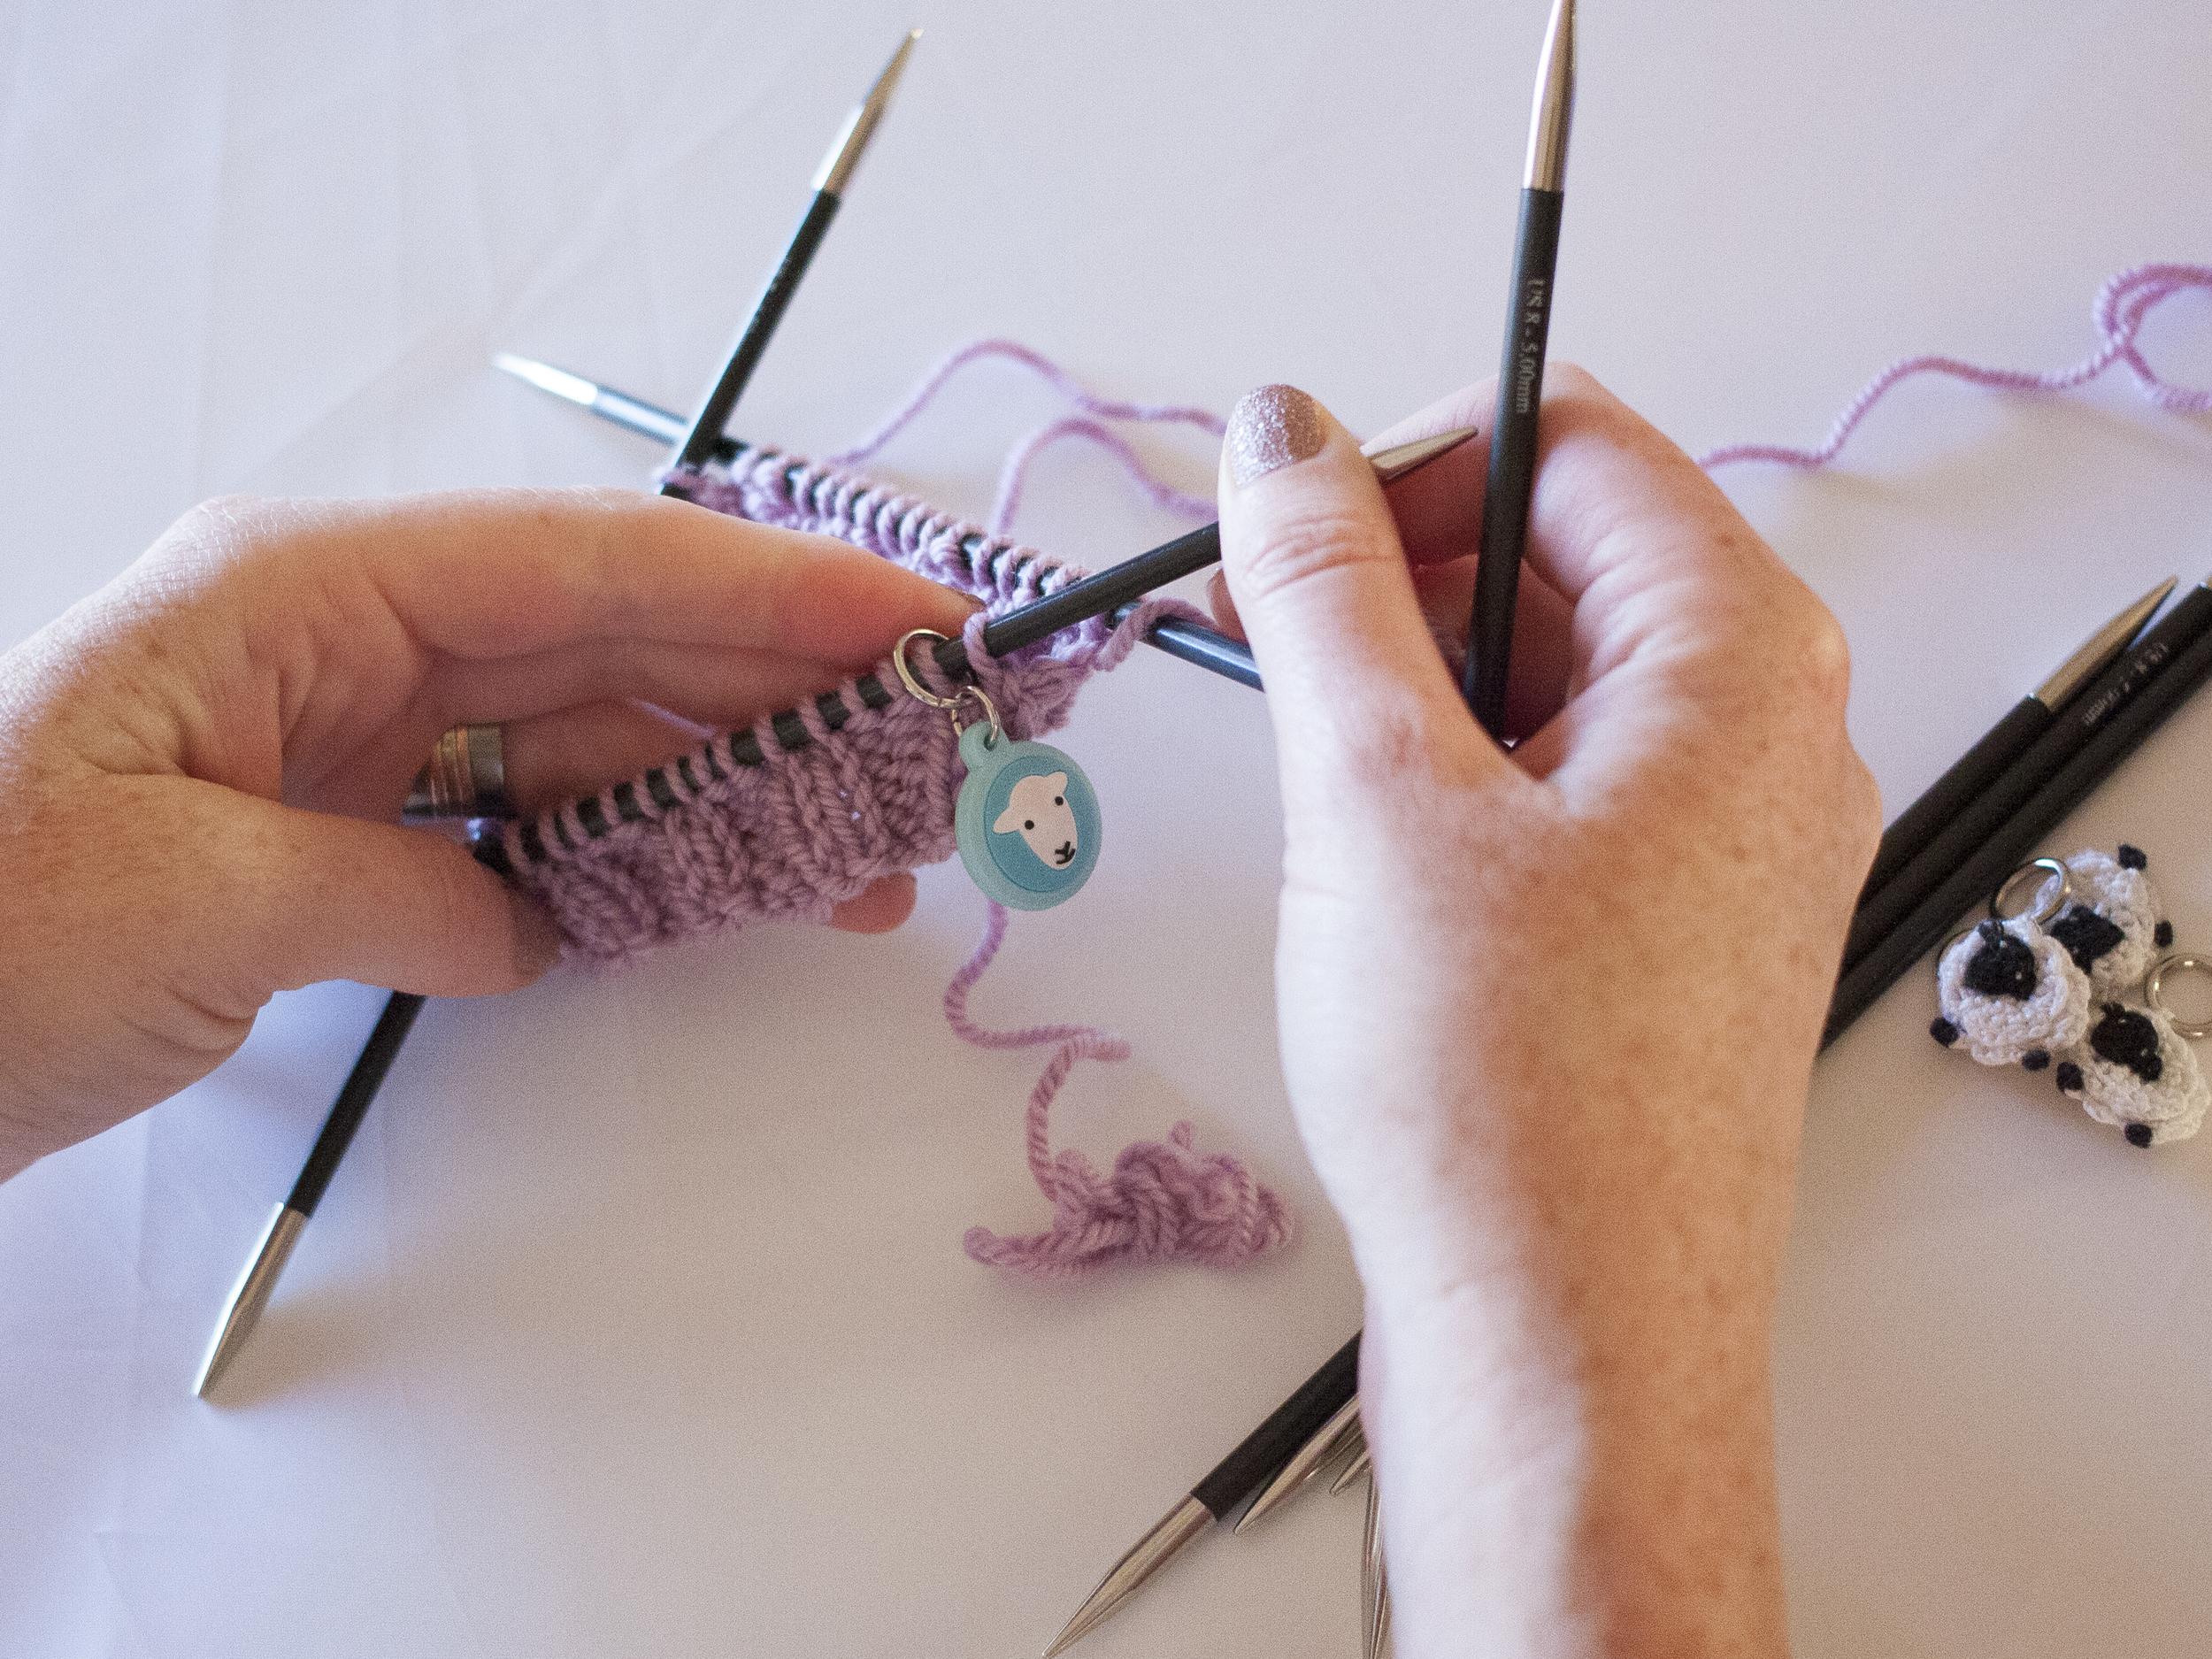 Adding stitch markers